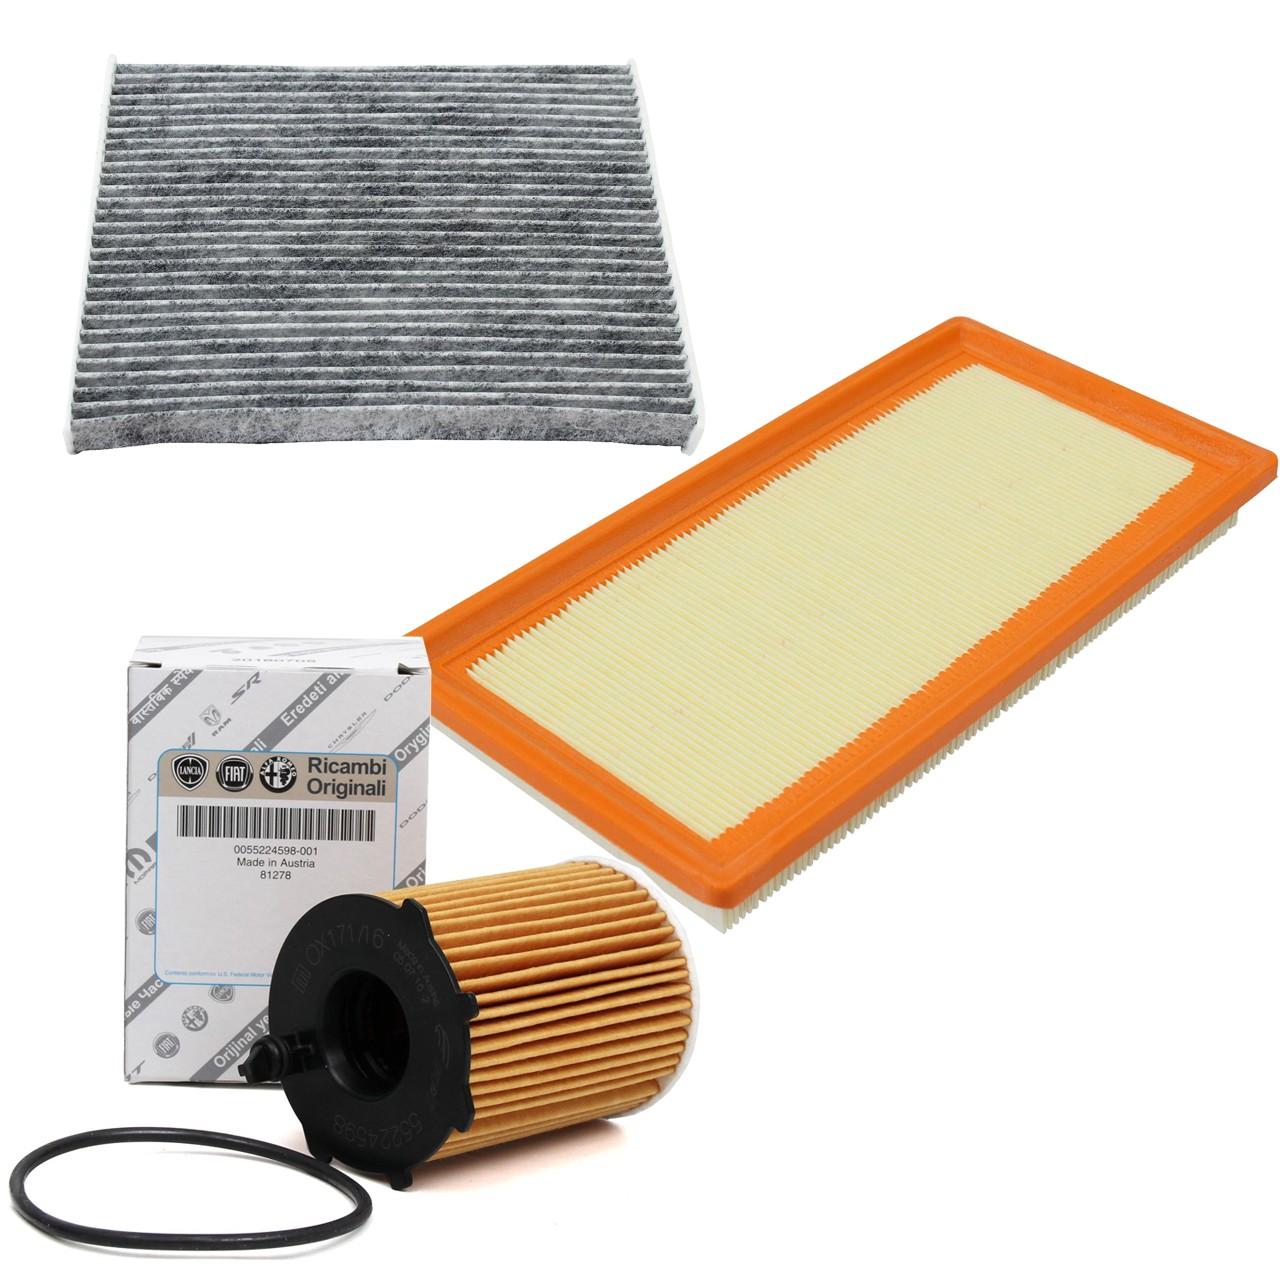 Filterset für ALFA ROMEO MITO (955_) FIAT 500 / C (312_) 0.9 86 / 101 / 105 PS